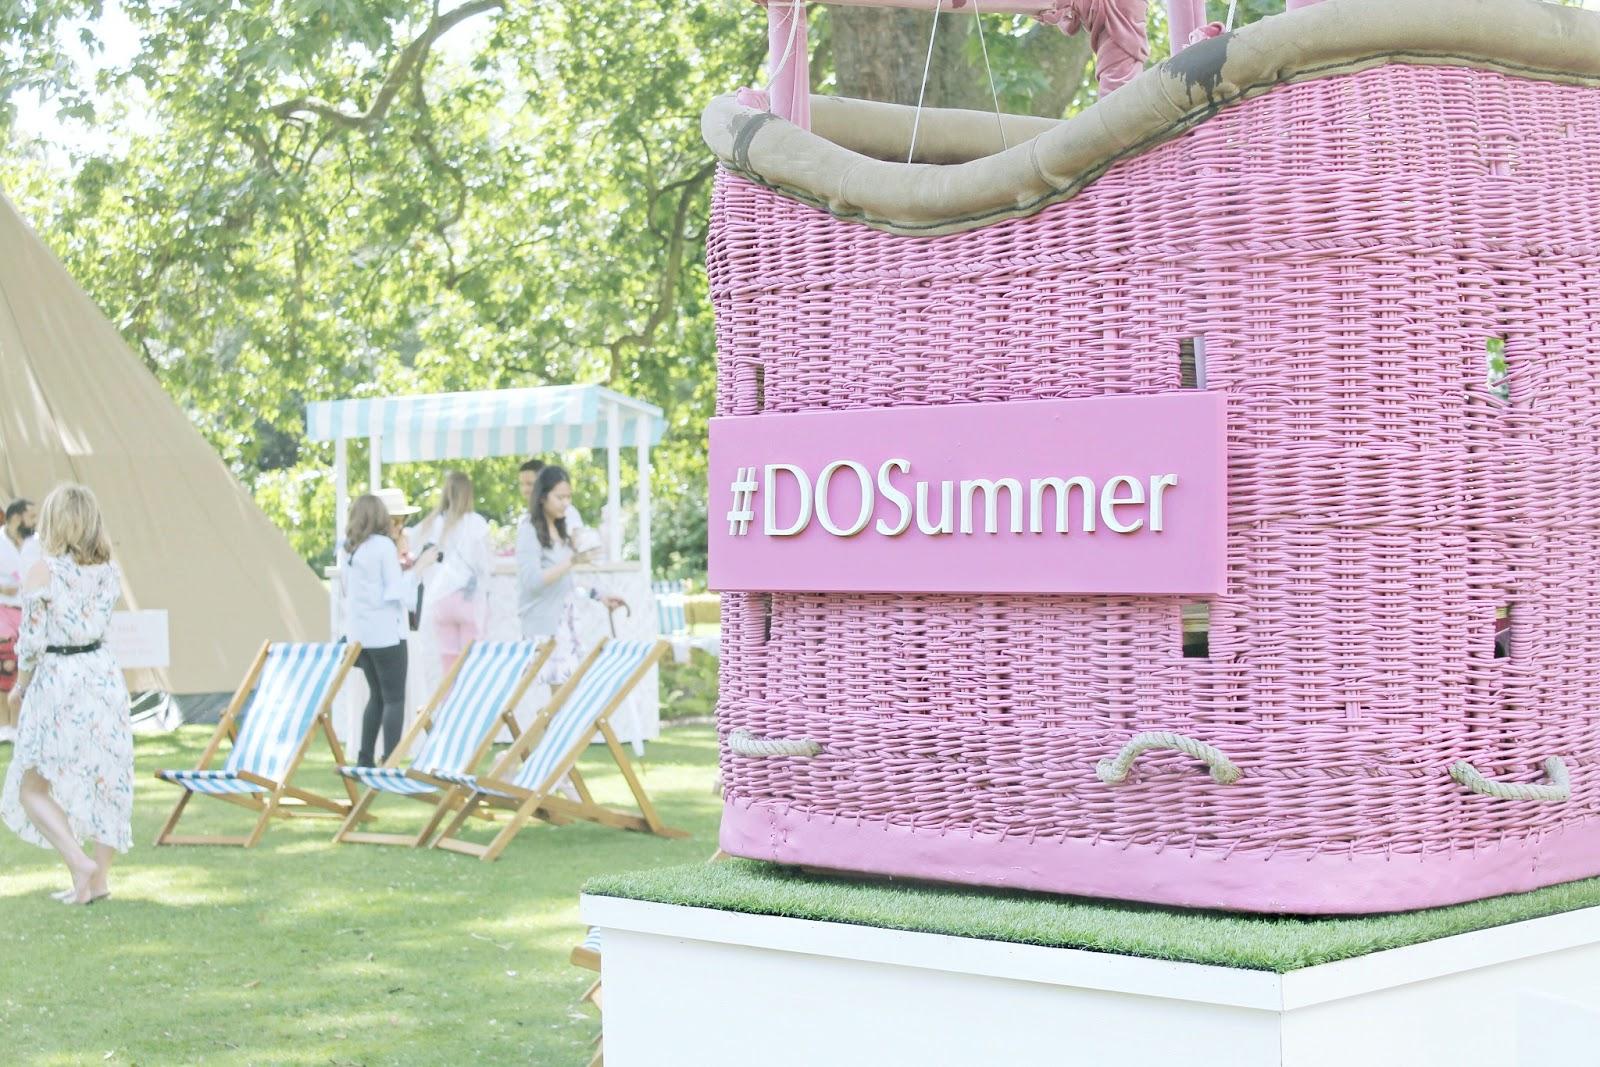 Pandora #DoSummer blog event